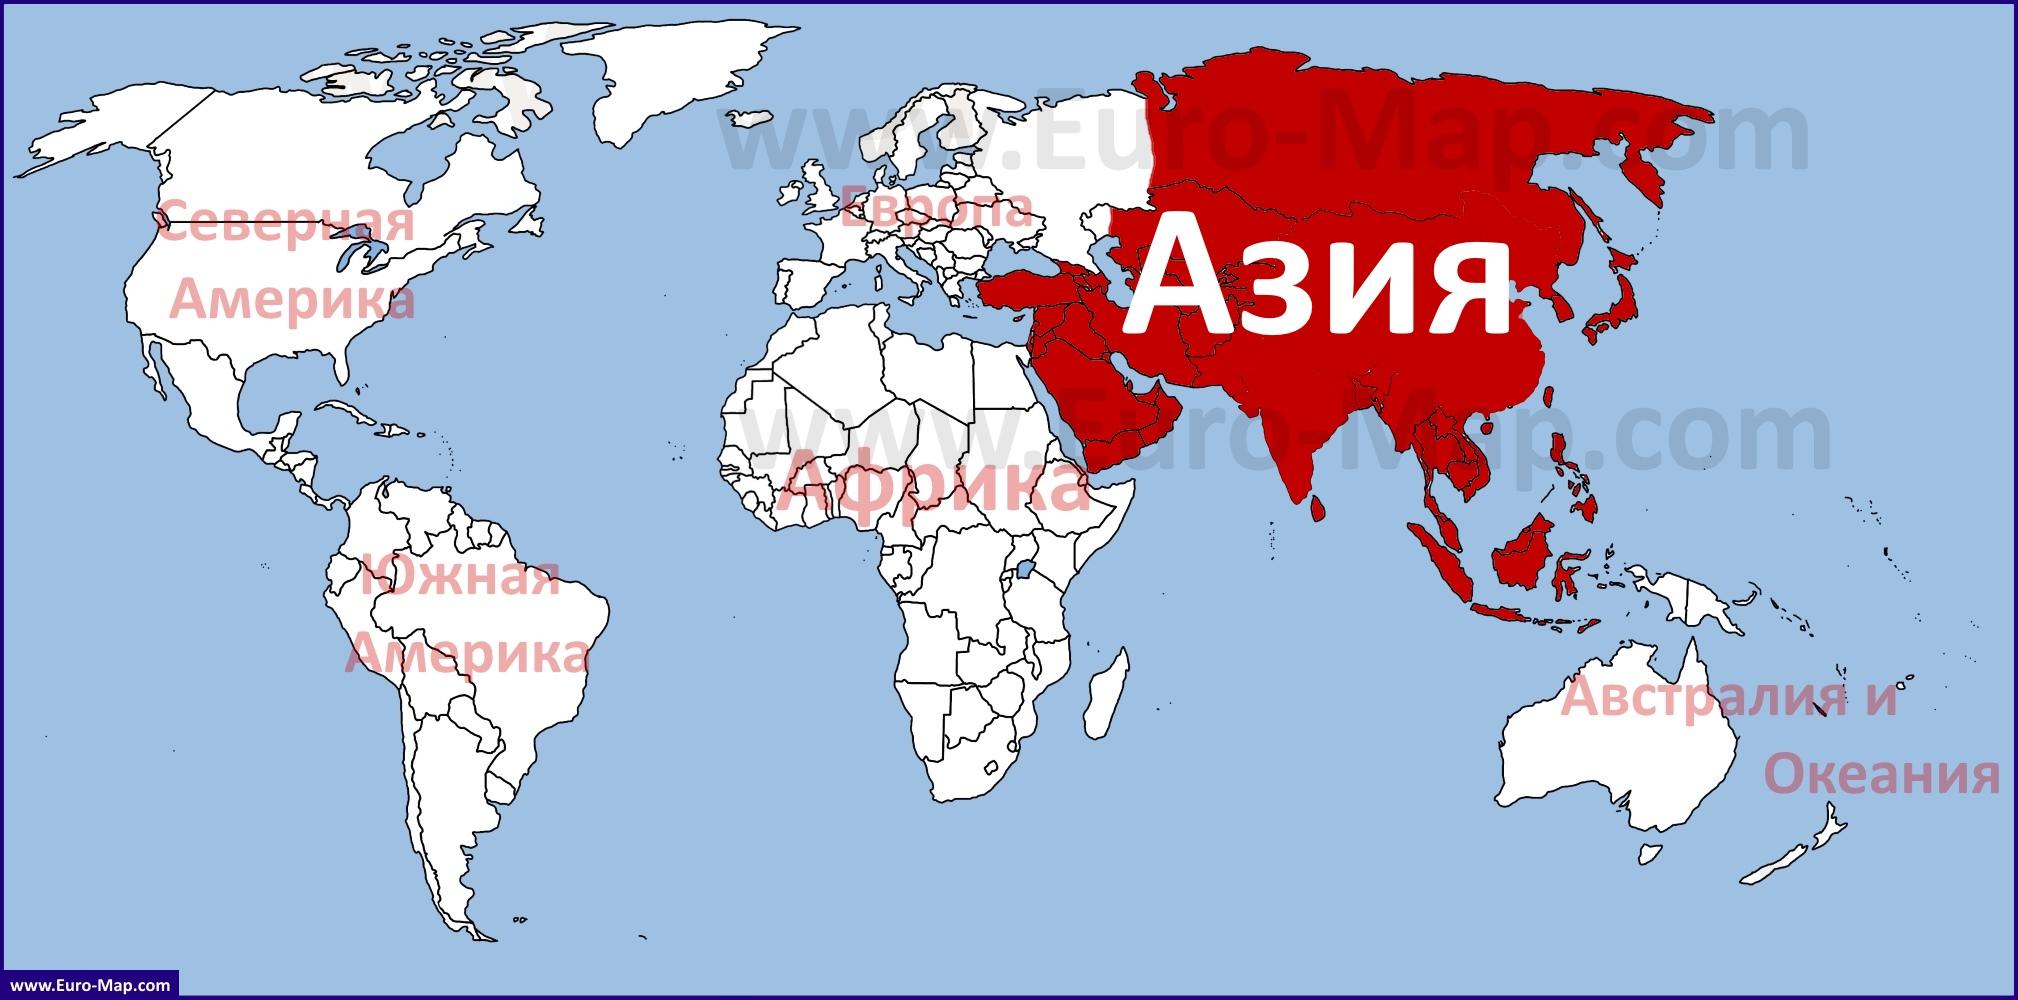 http://euro-map.com/asiya/asiya-na-karte-mira.jpg